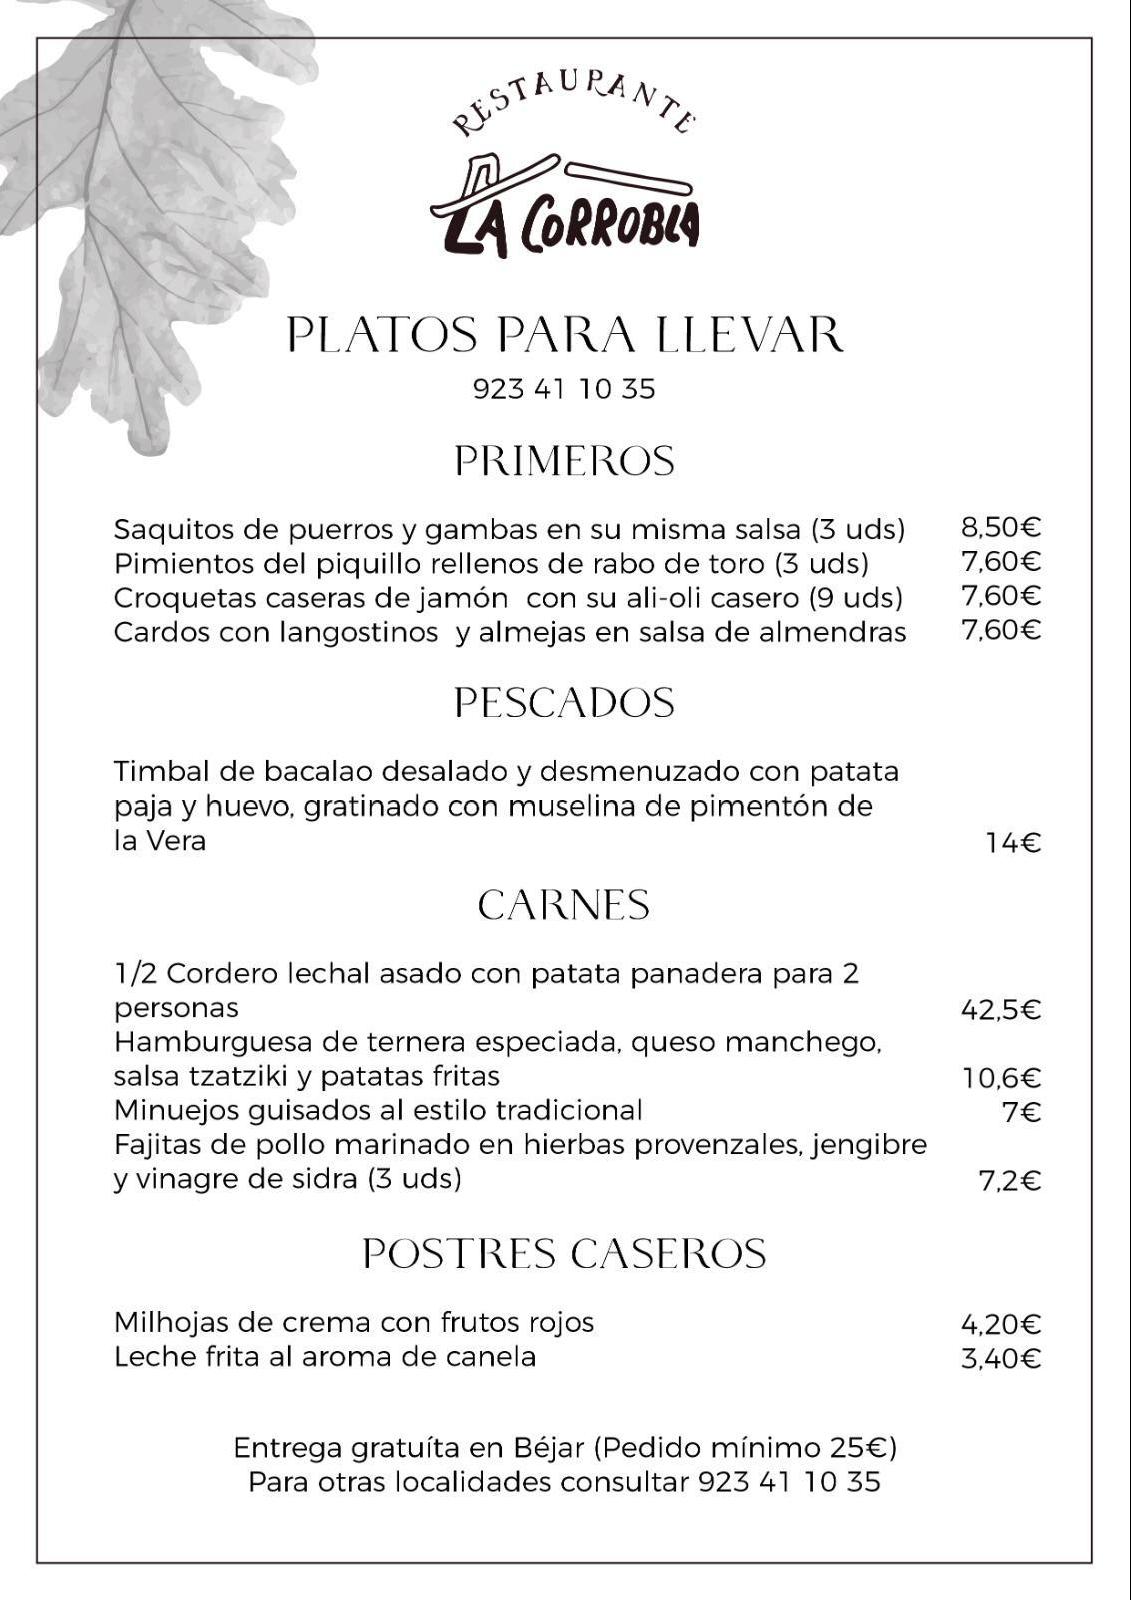 Platos_llevar.jpg